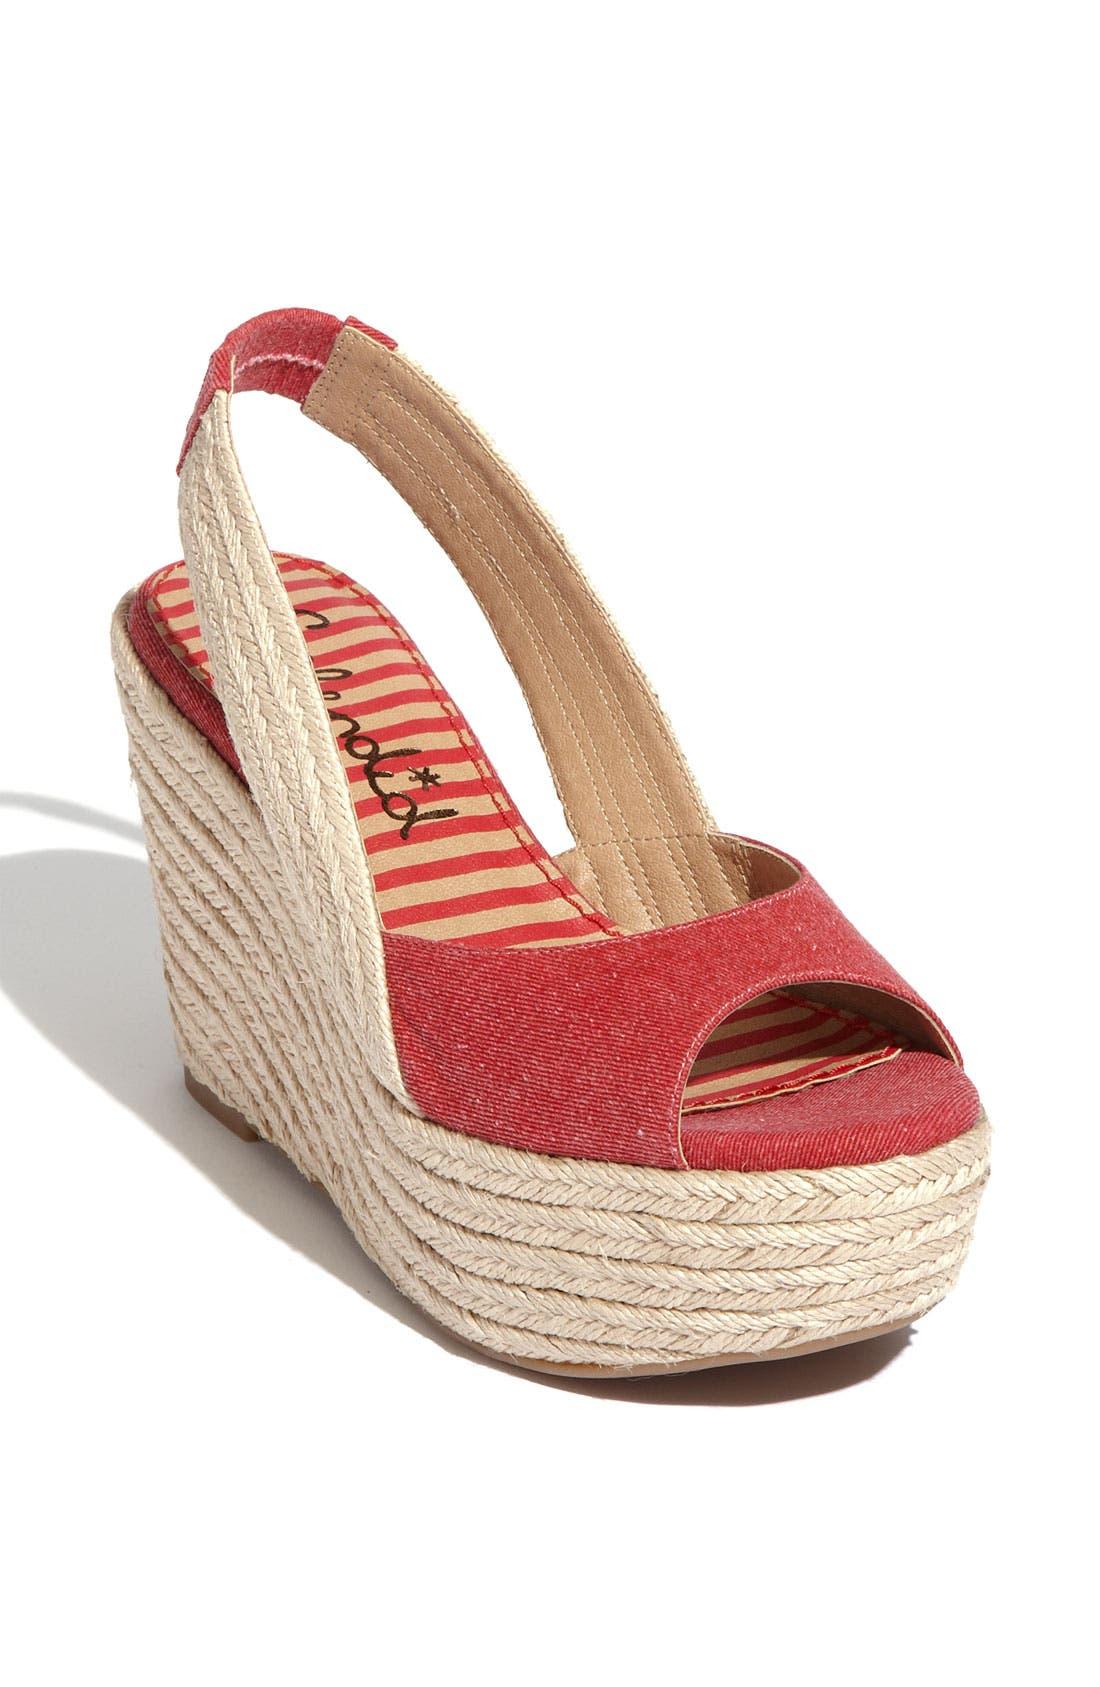 Alternate Image 1 Selected - Splendid 'Perfect' Espadrille Sandal